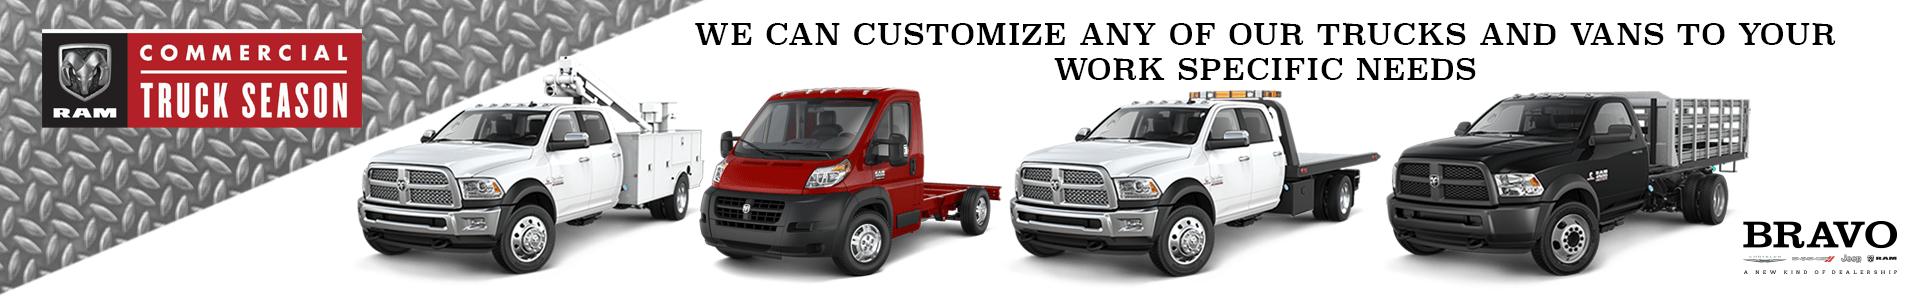 RAM- Work Truck